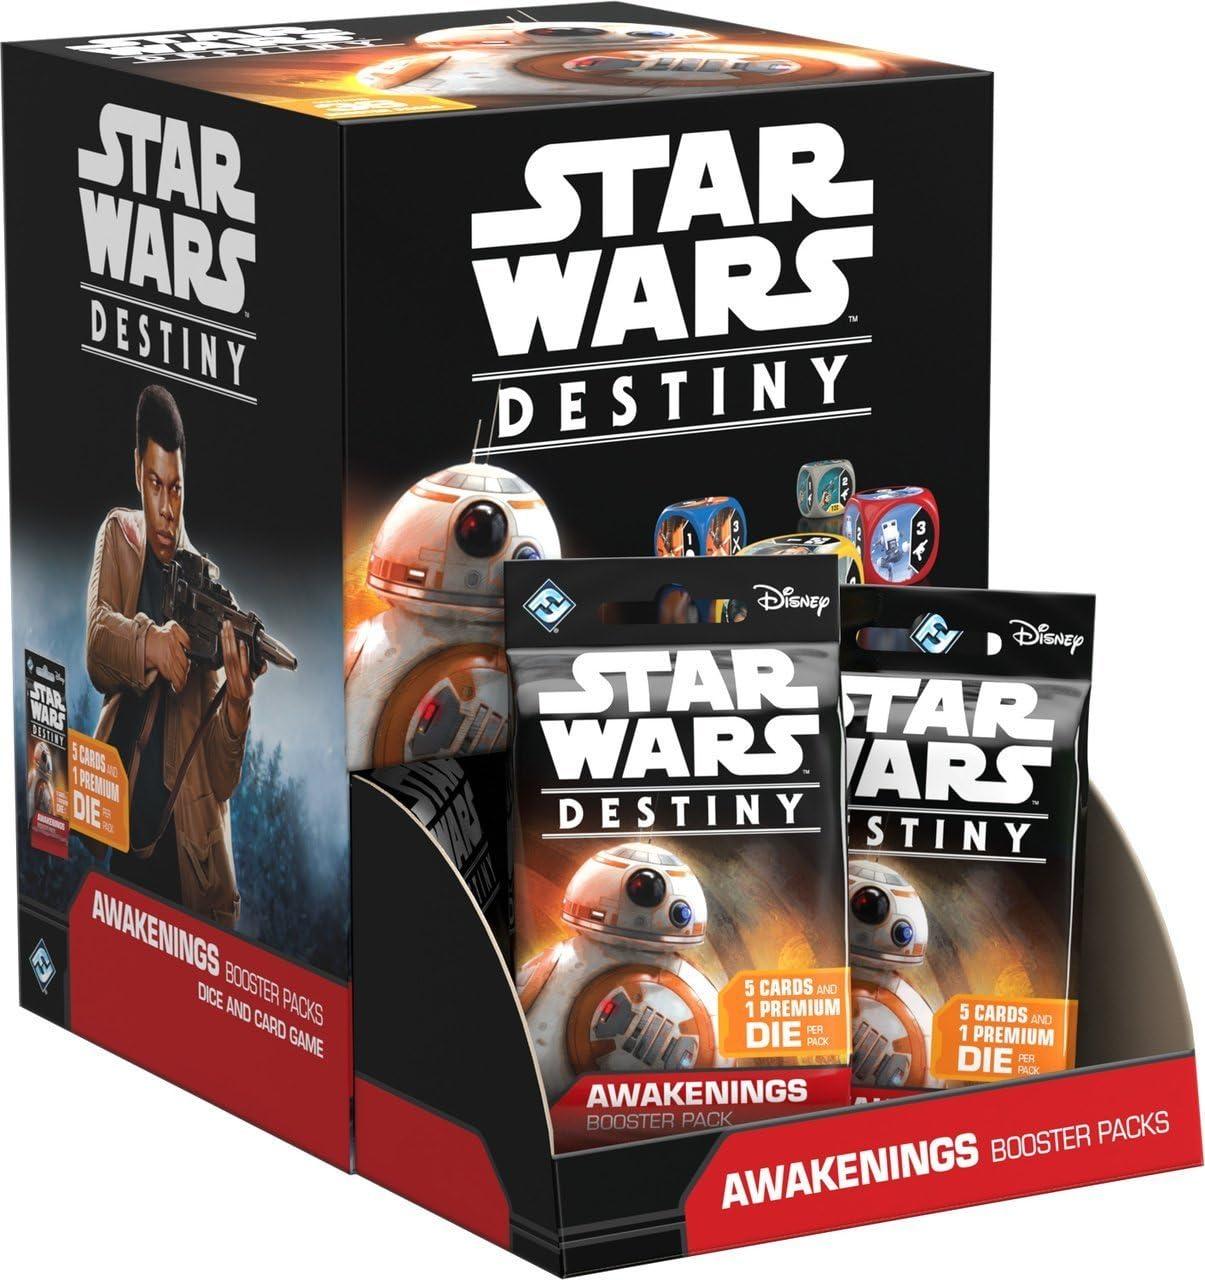 Star Wars Destiny TCG: Awakenings Display Box (36 Booster Packs) Gravity Feed